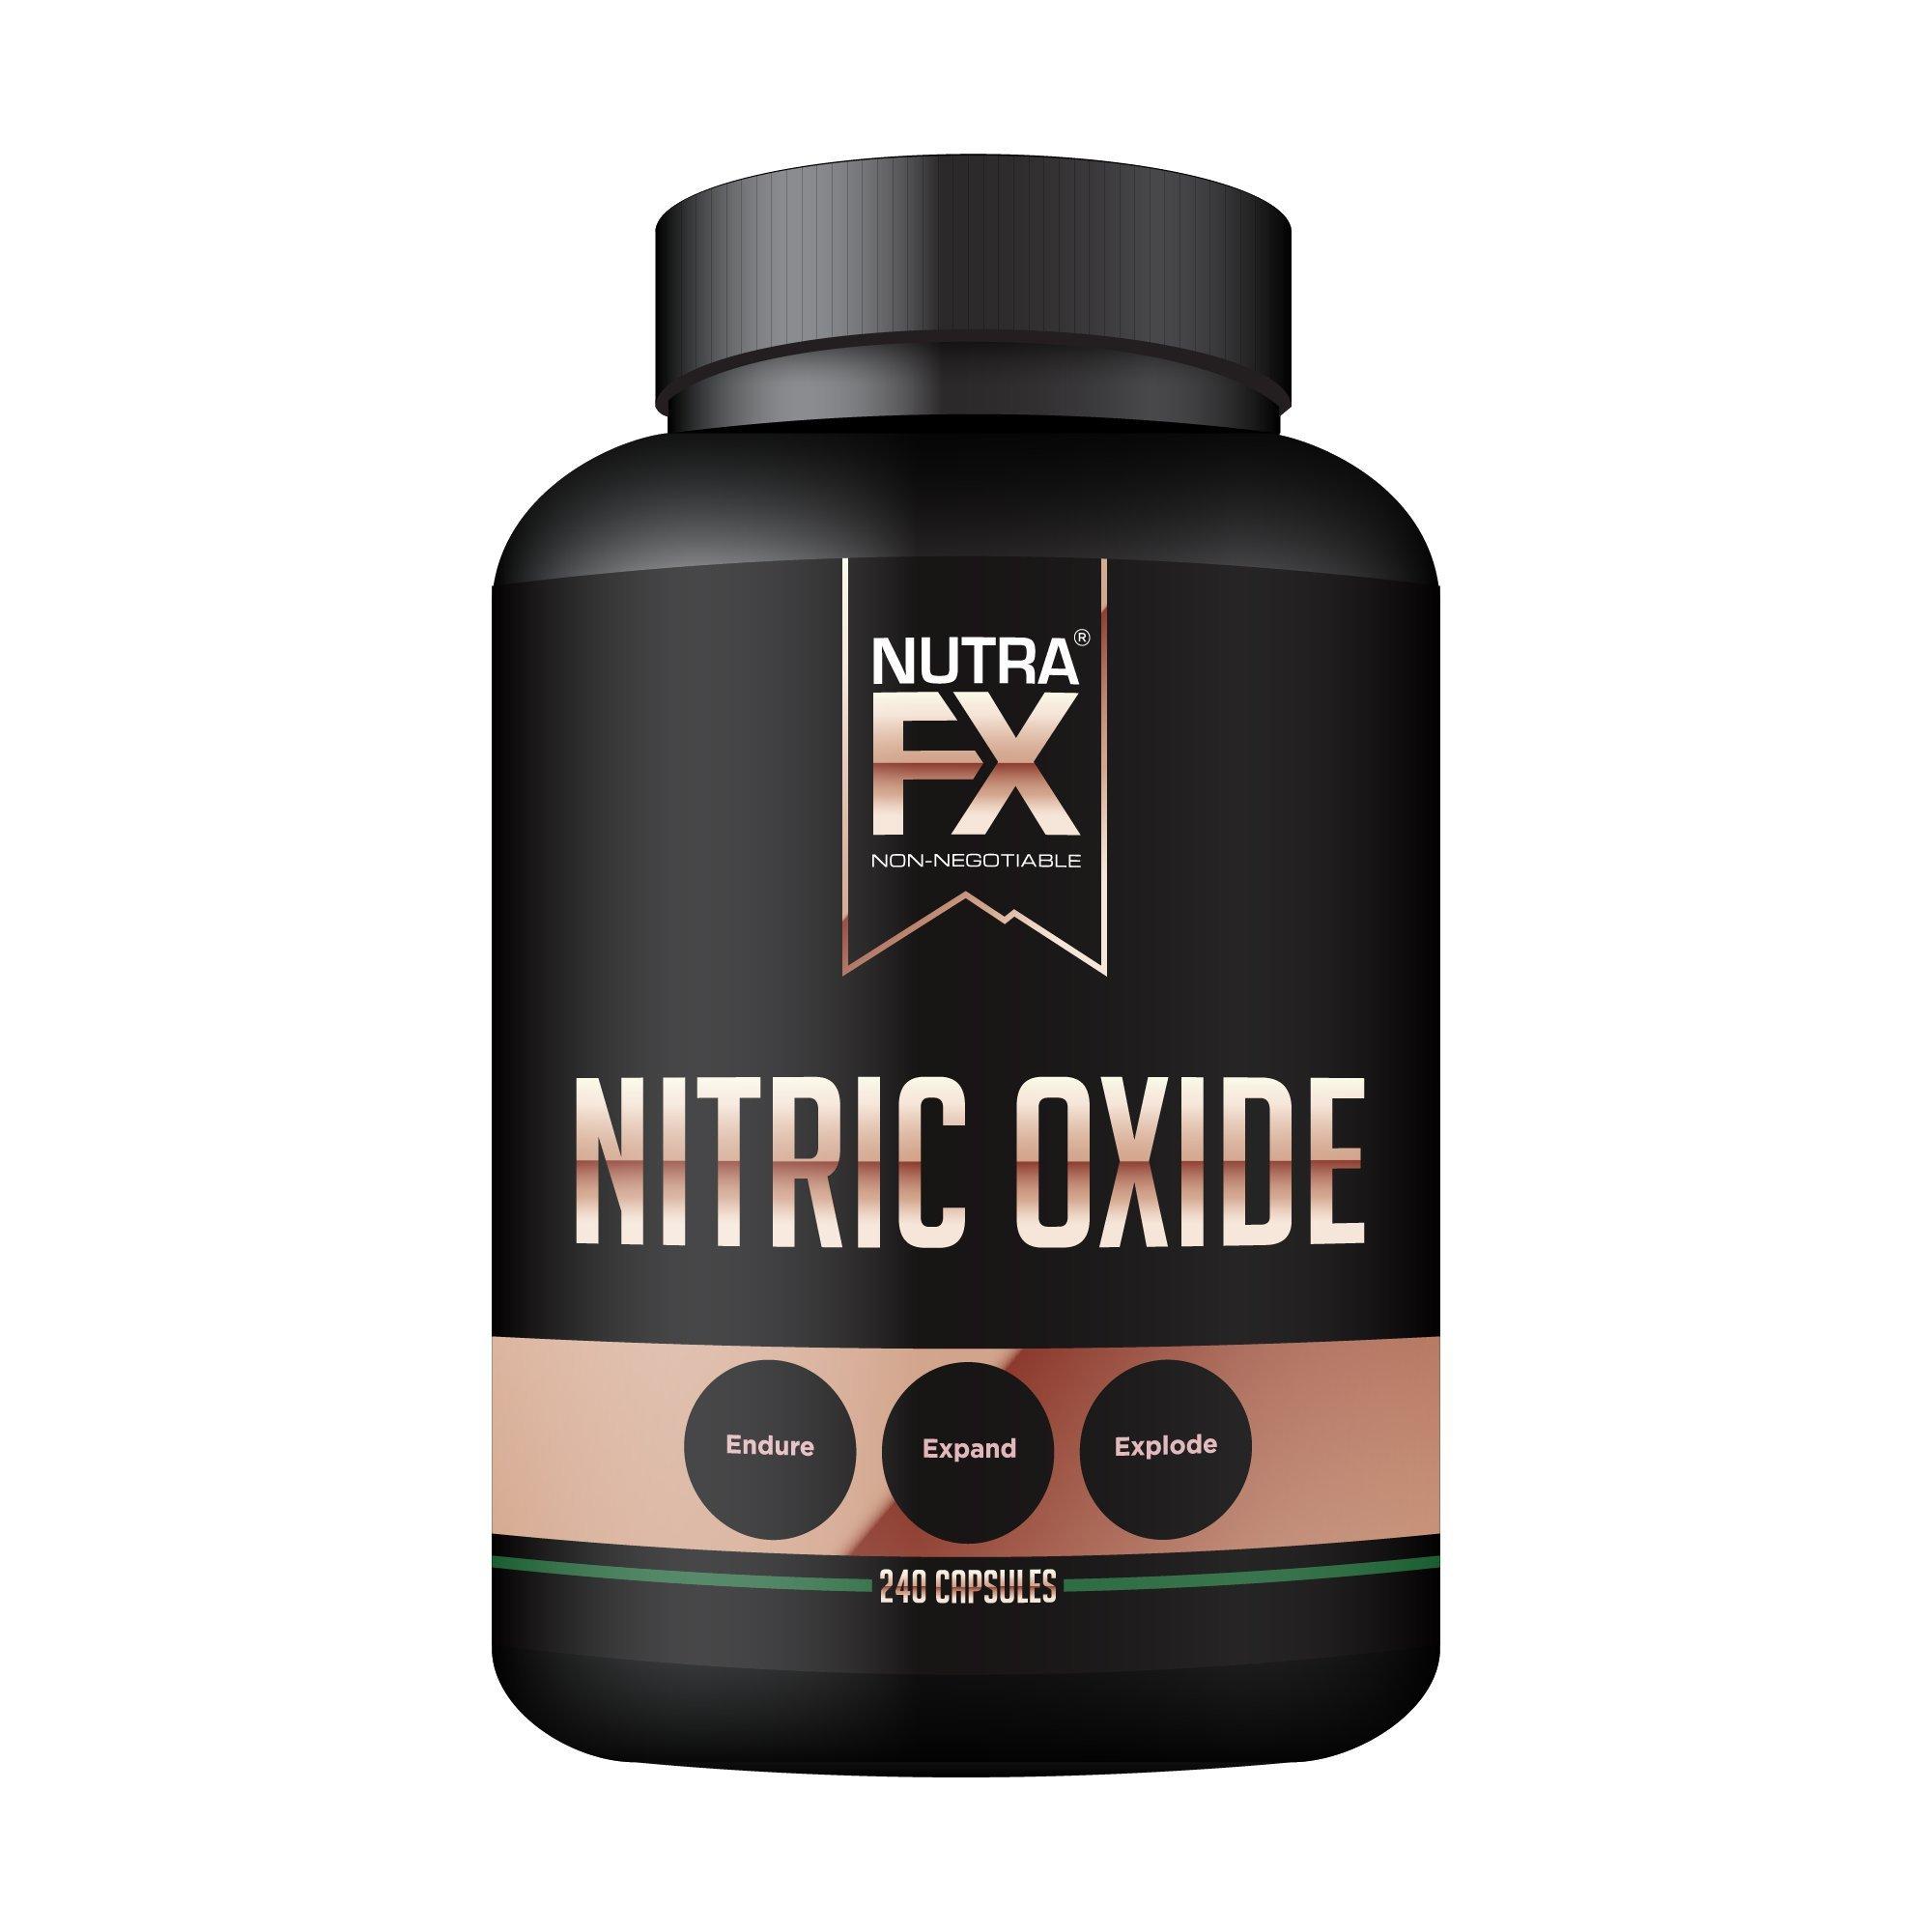 Nitric Oxide Booster Premium Muscle Pump Supplement Endurance Vasodilator by NutraFX